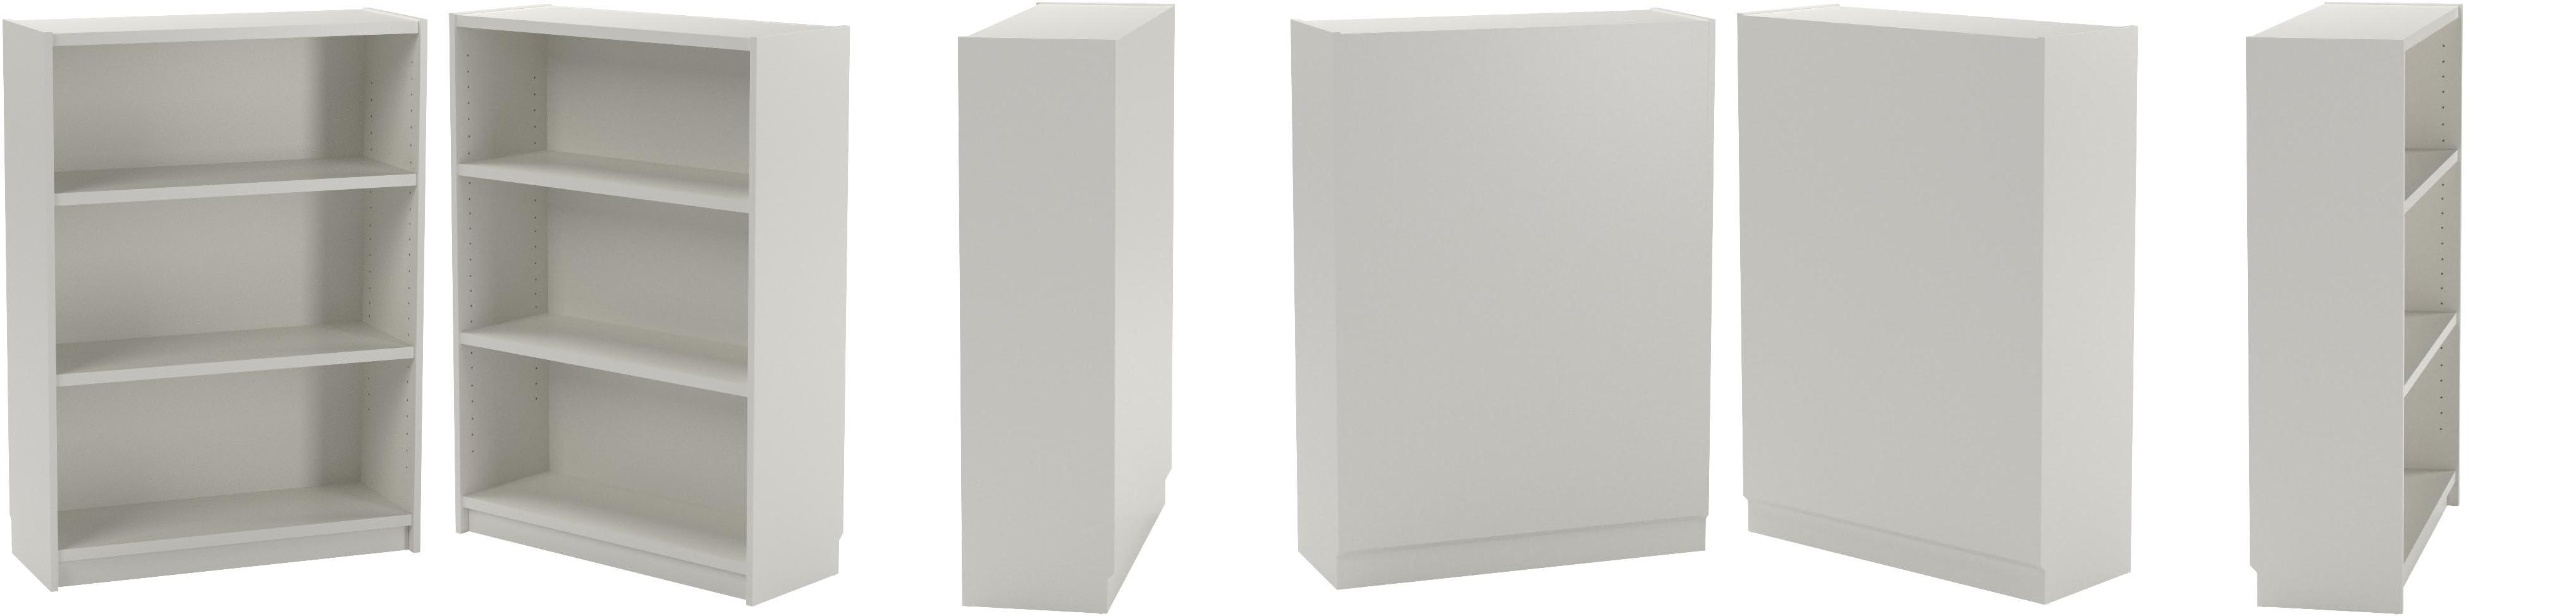 IKEA BILLY  Bücherregal White  Amazon.de Home & Kitchen